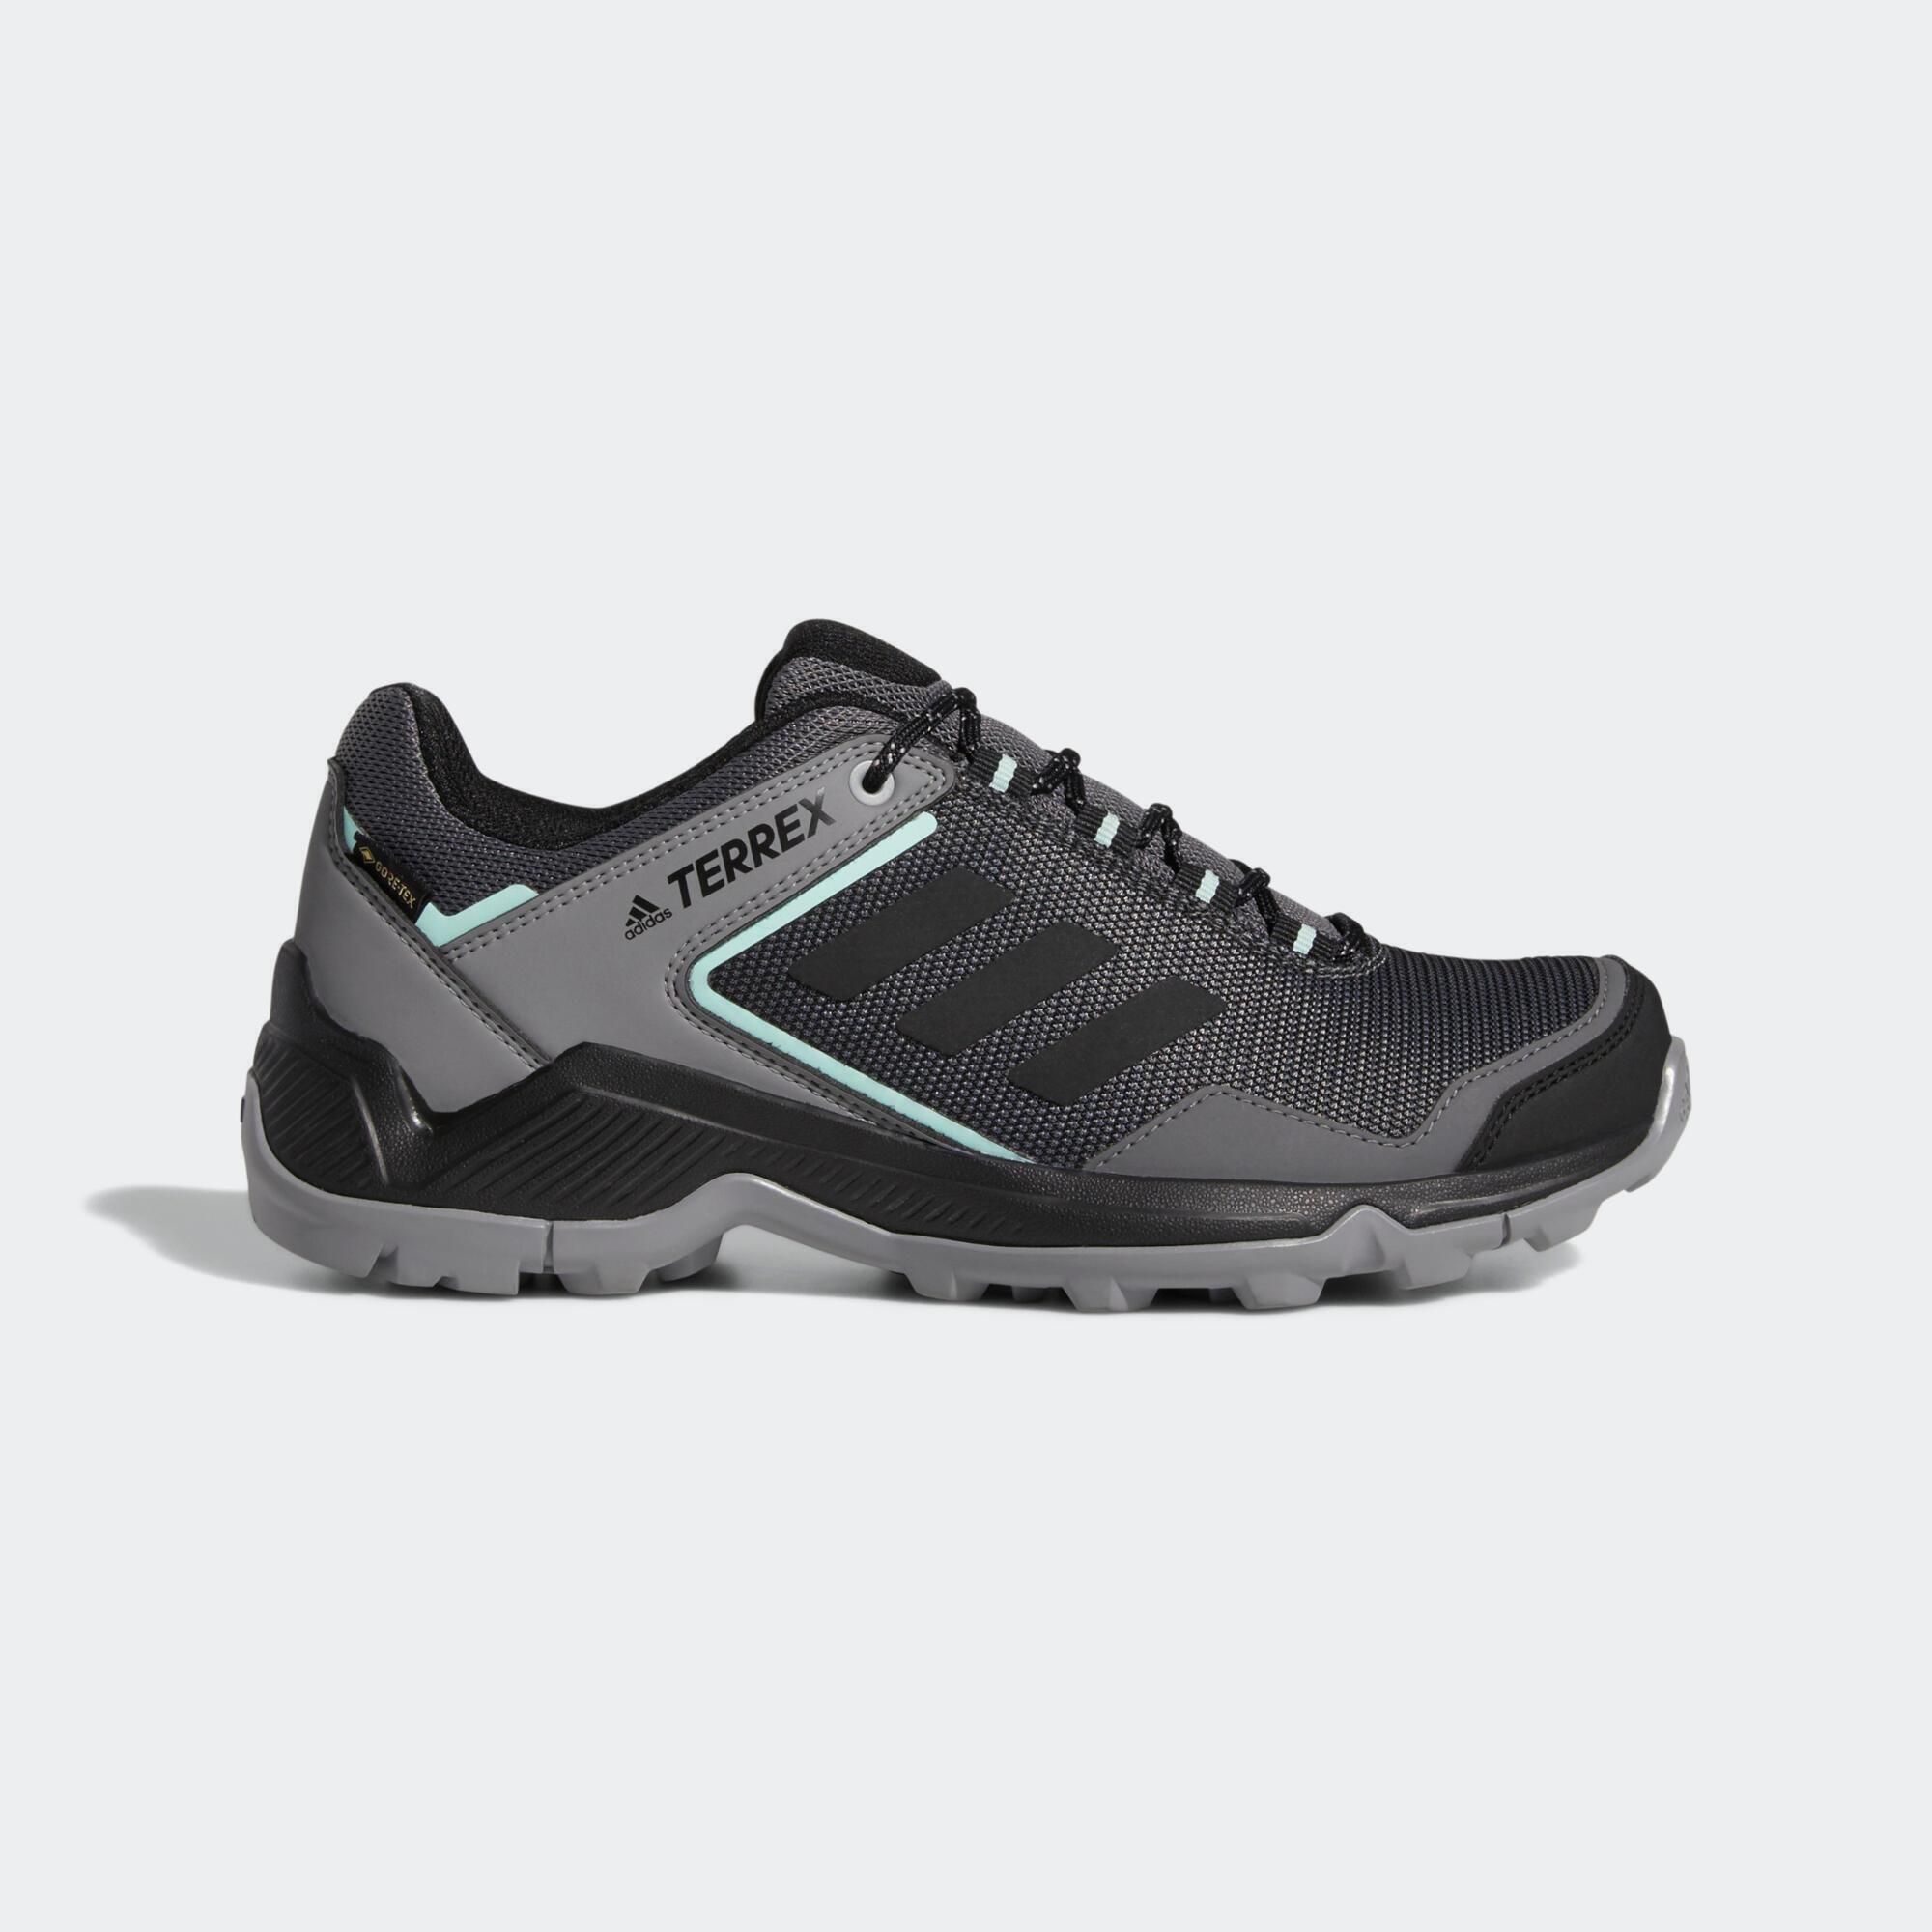 عائق خطوة لا مفر منه adidas impermeable chaussure - icedcourses.com